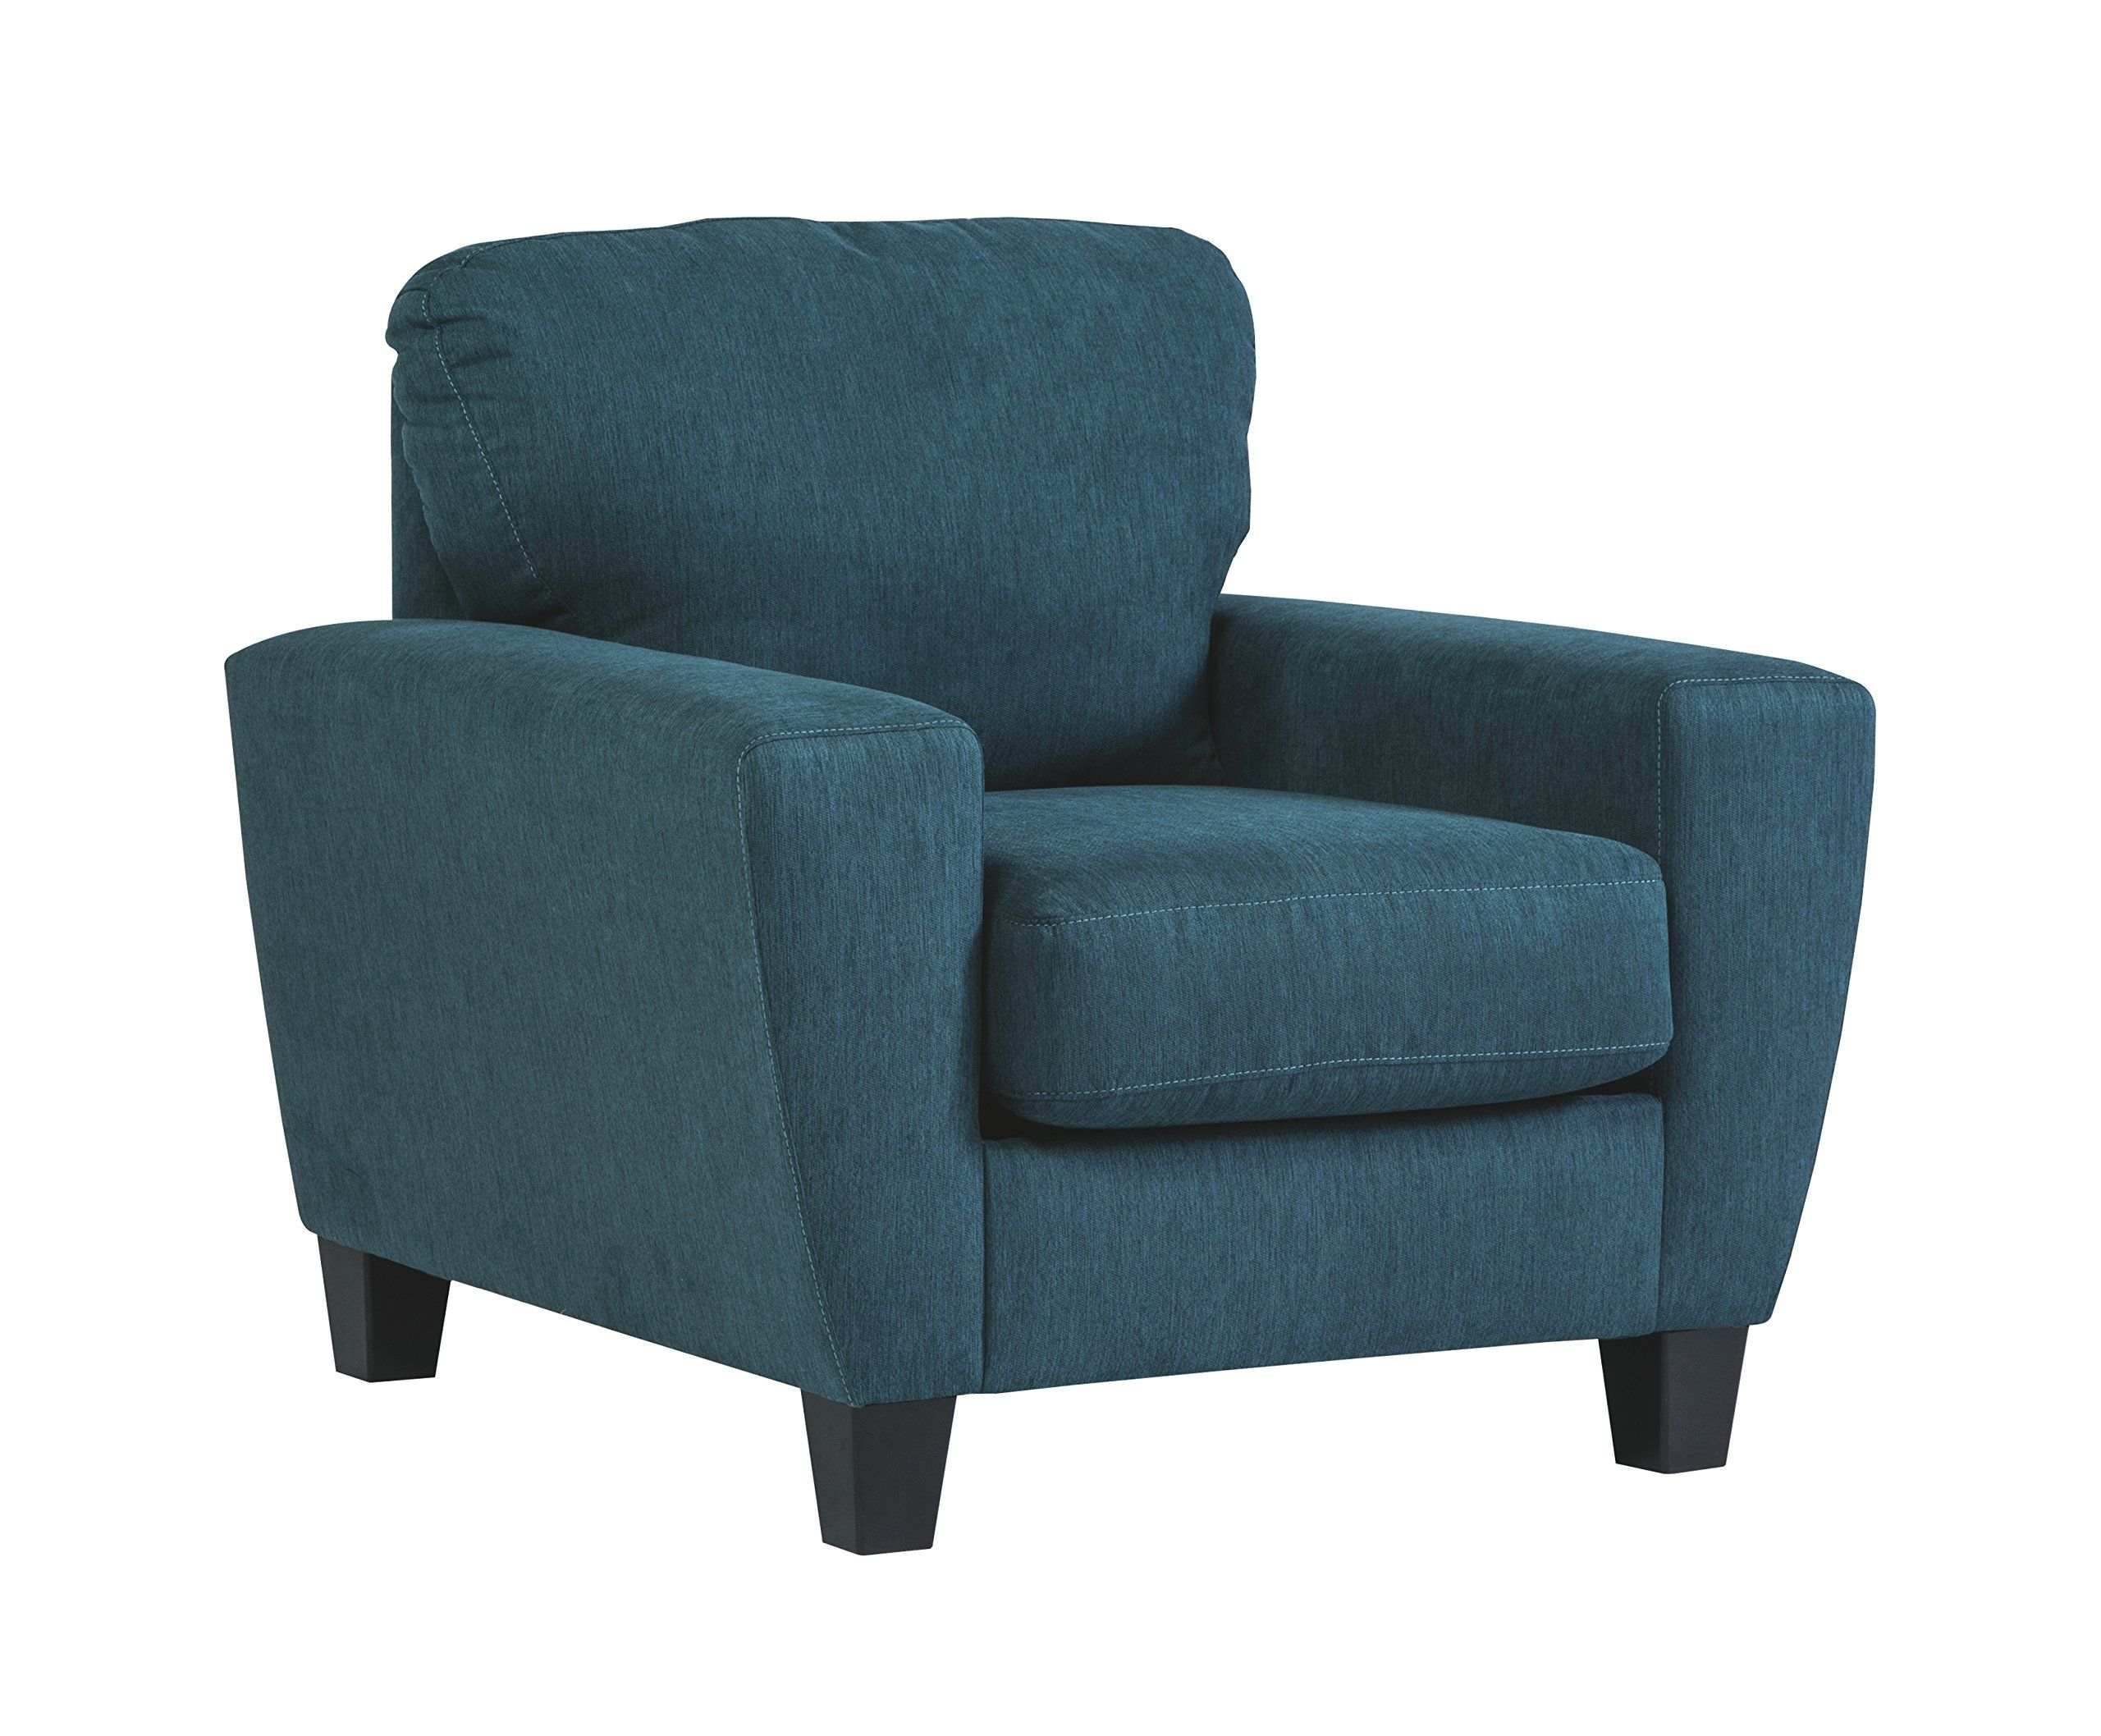 Ashley Furniture Signature Design Sagen Accent Side Chair